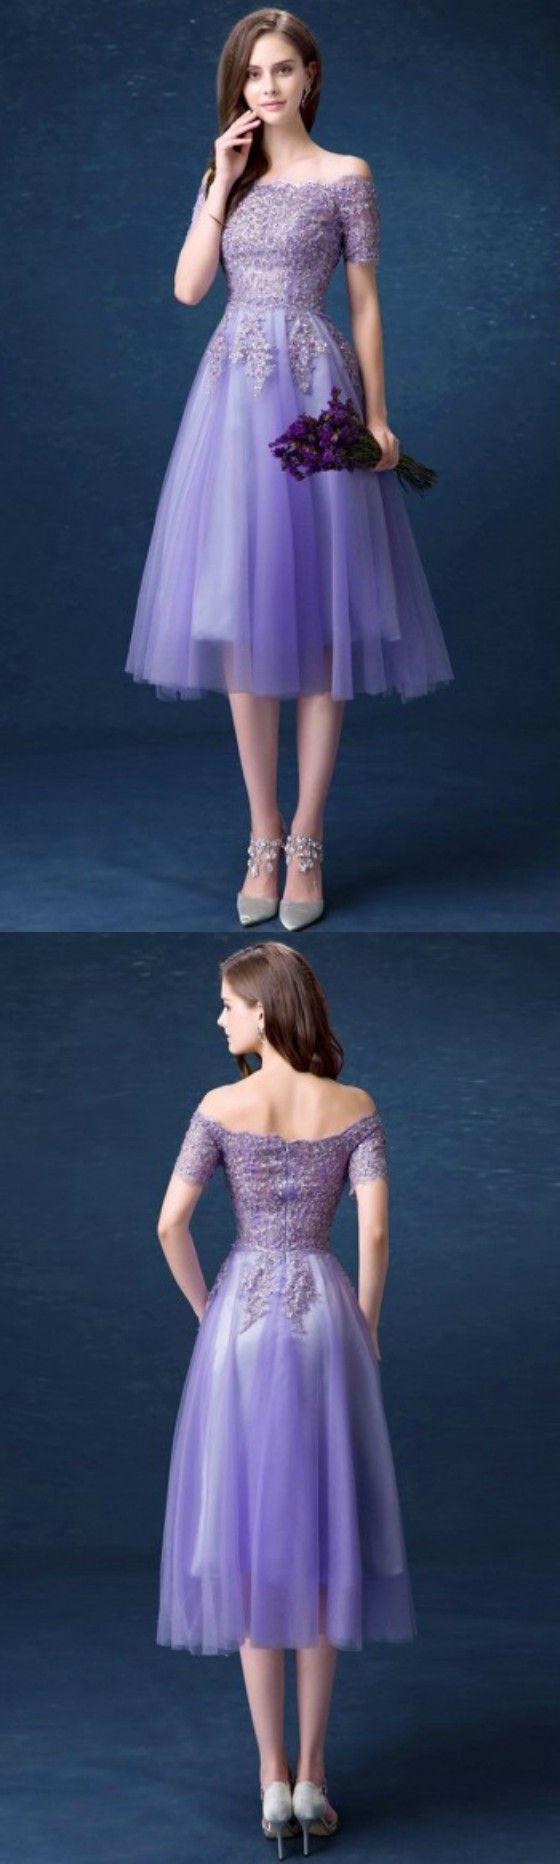 Modest cheap homecoming dresses purple off the shoulder tea length